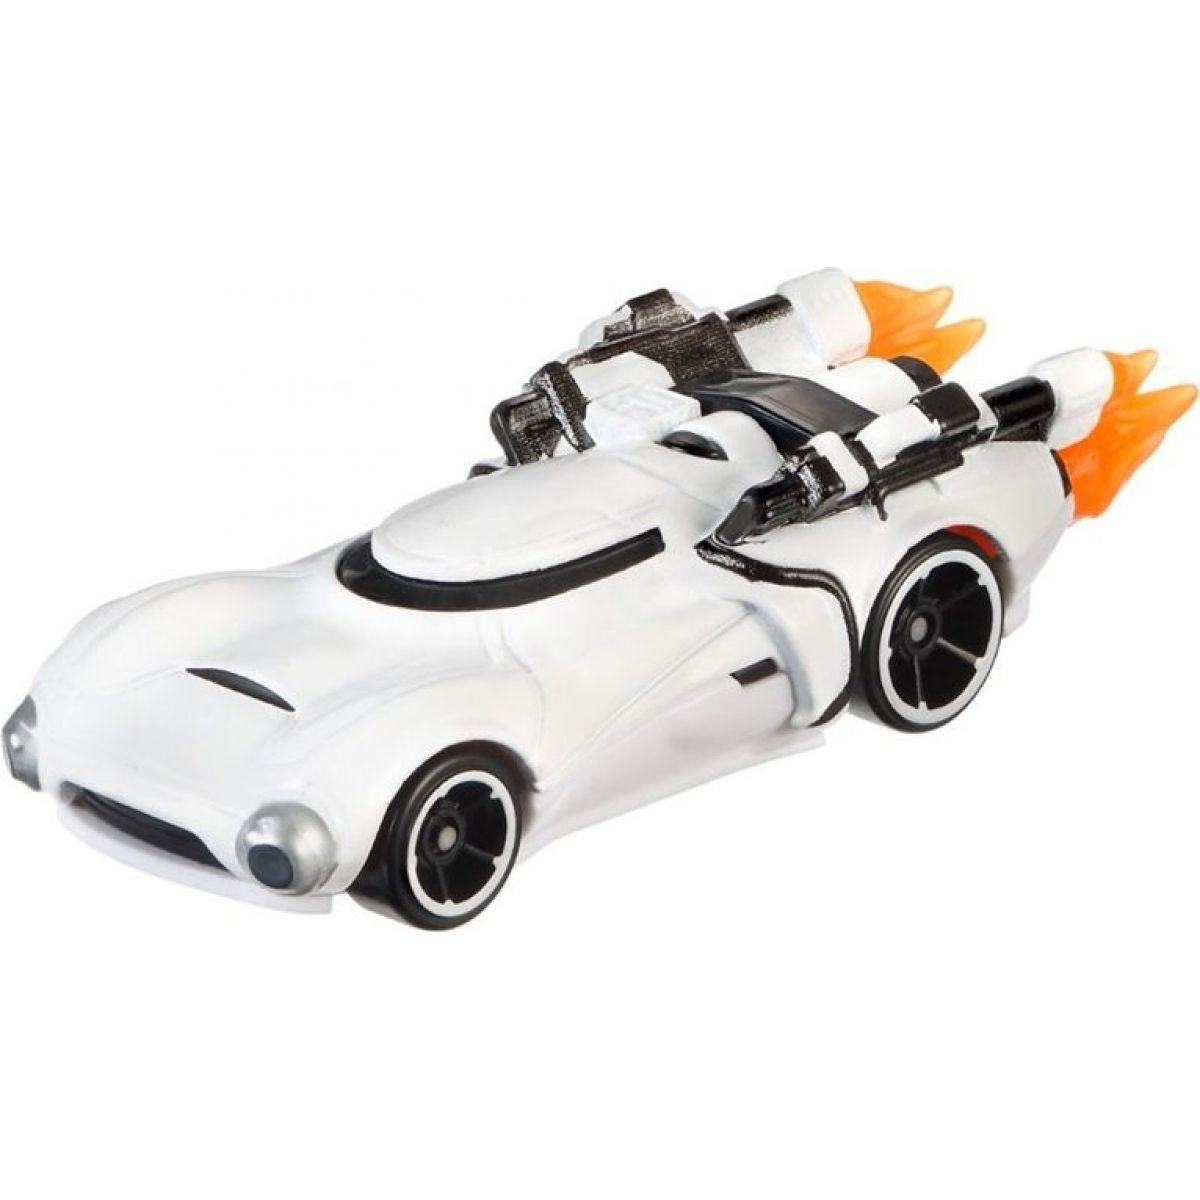 Hot Wheels Star Wars Character cars angličák - Flametrooper DXP30